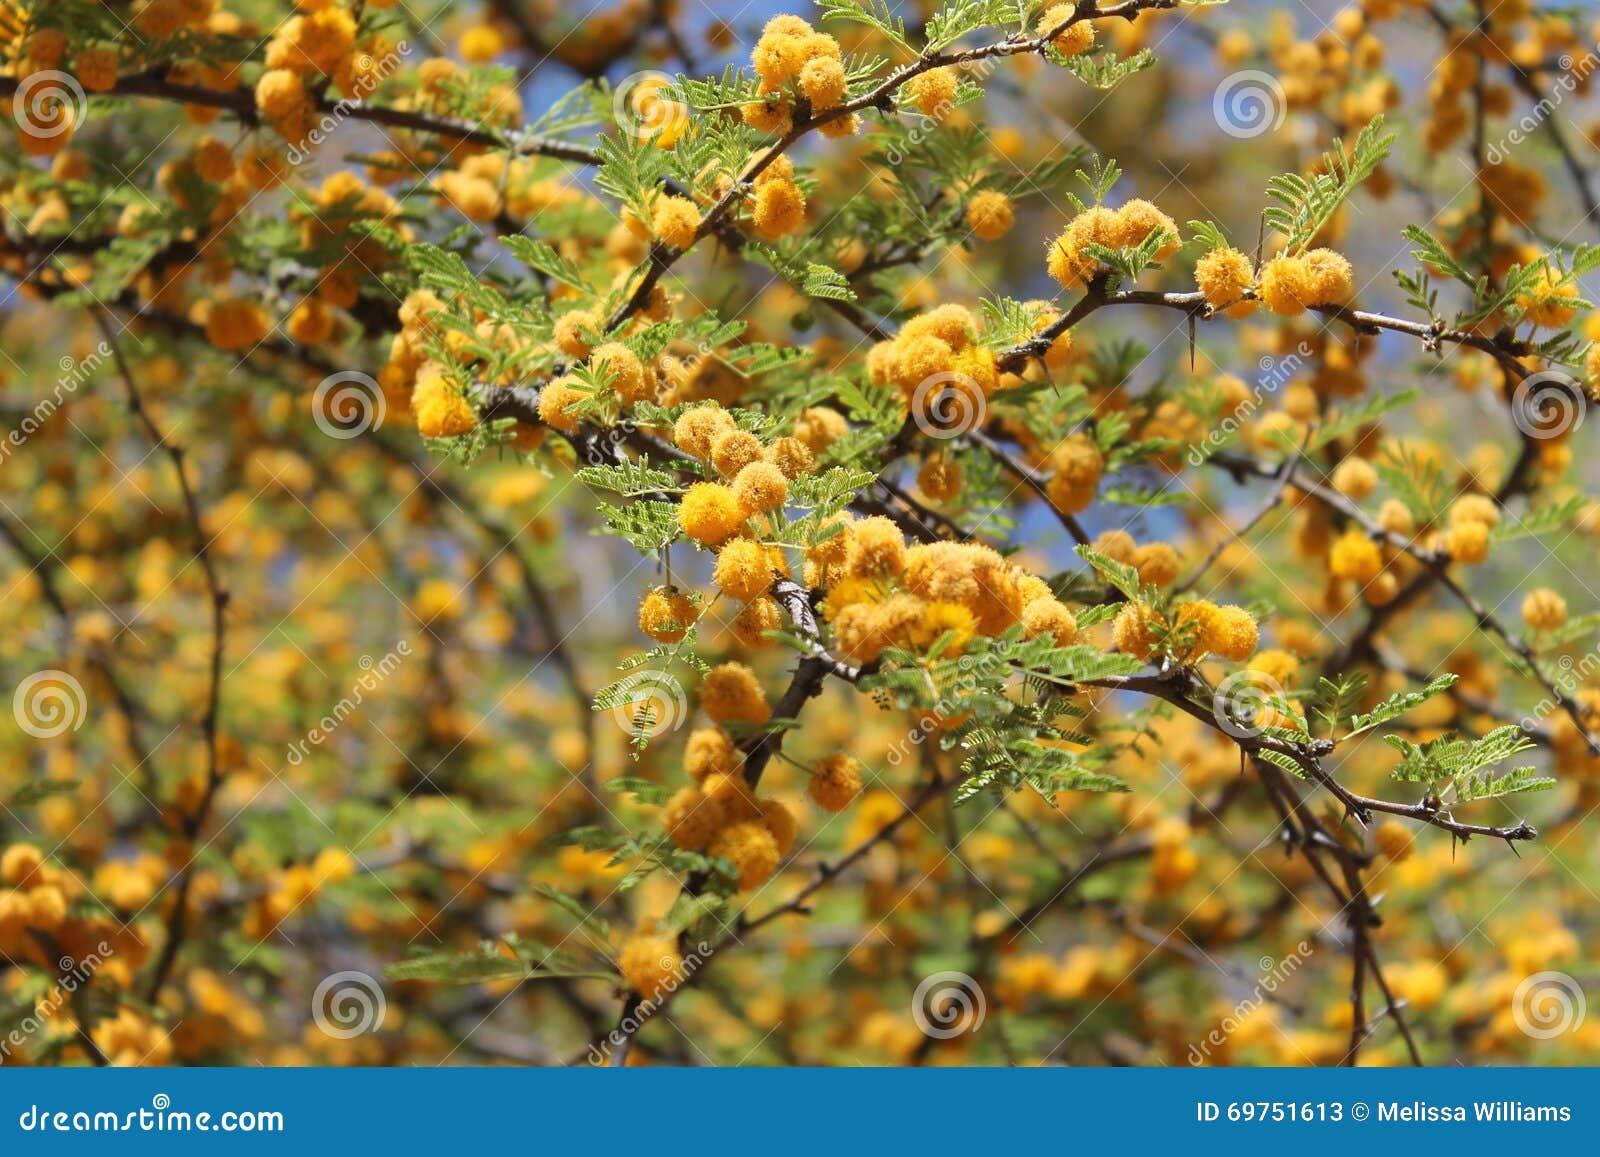 Yellow Texas Mesquite Tree Flowers Stock Image Image Of Yellow